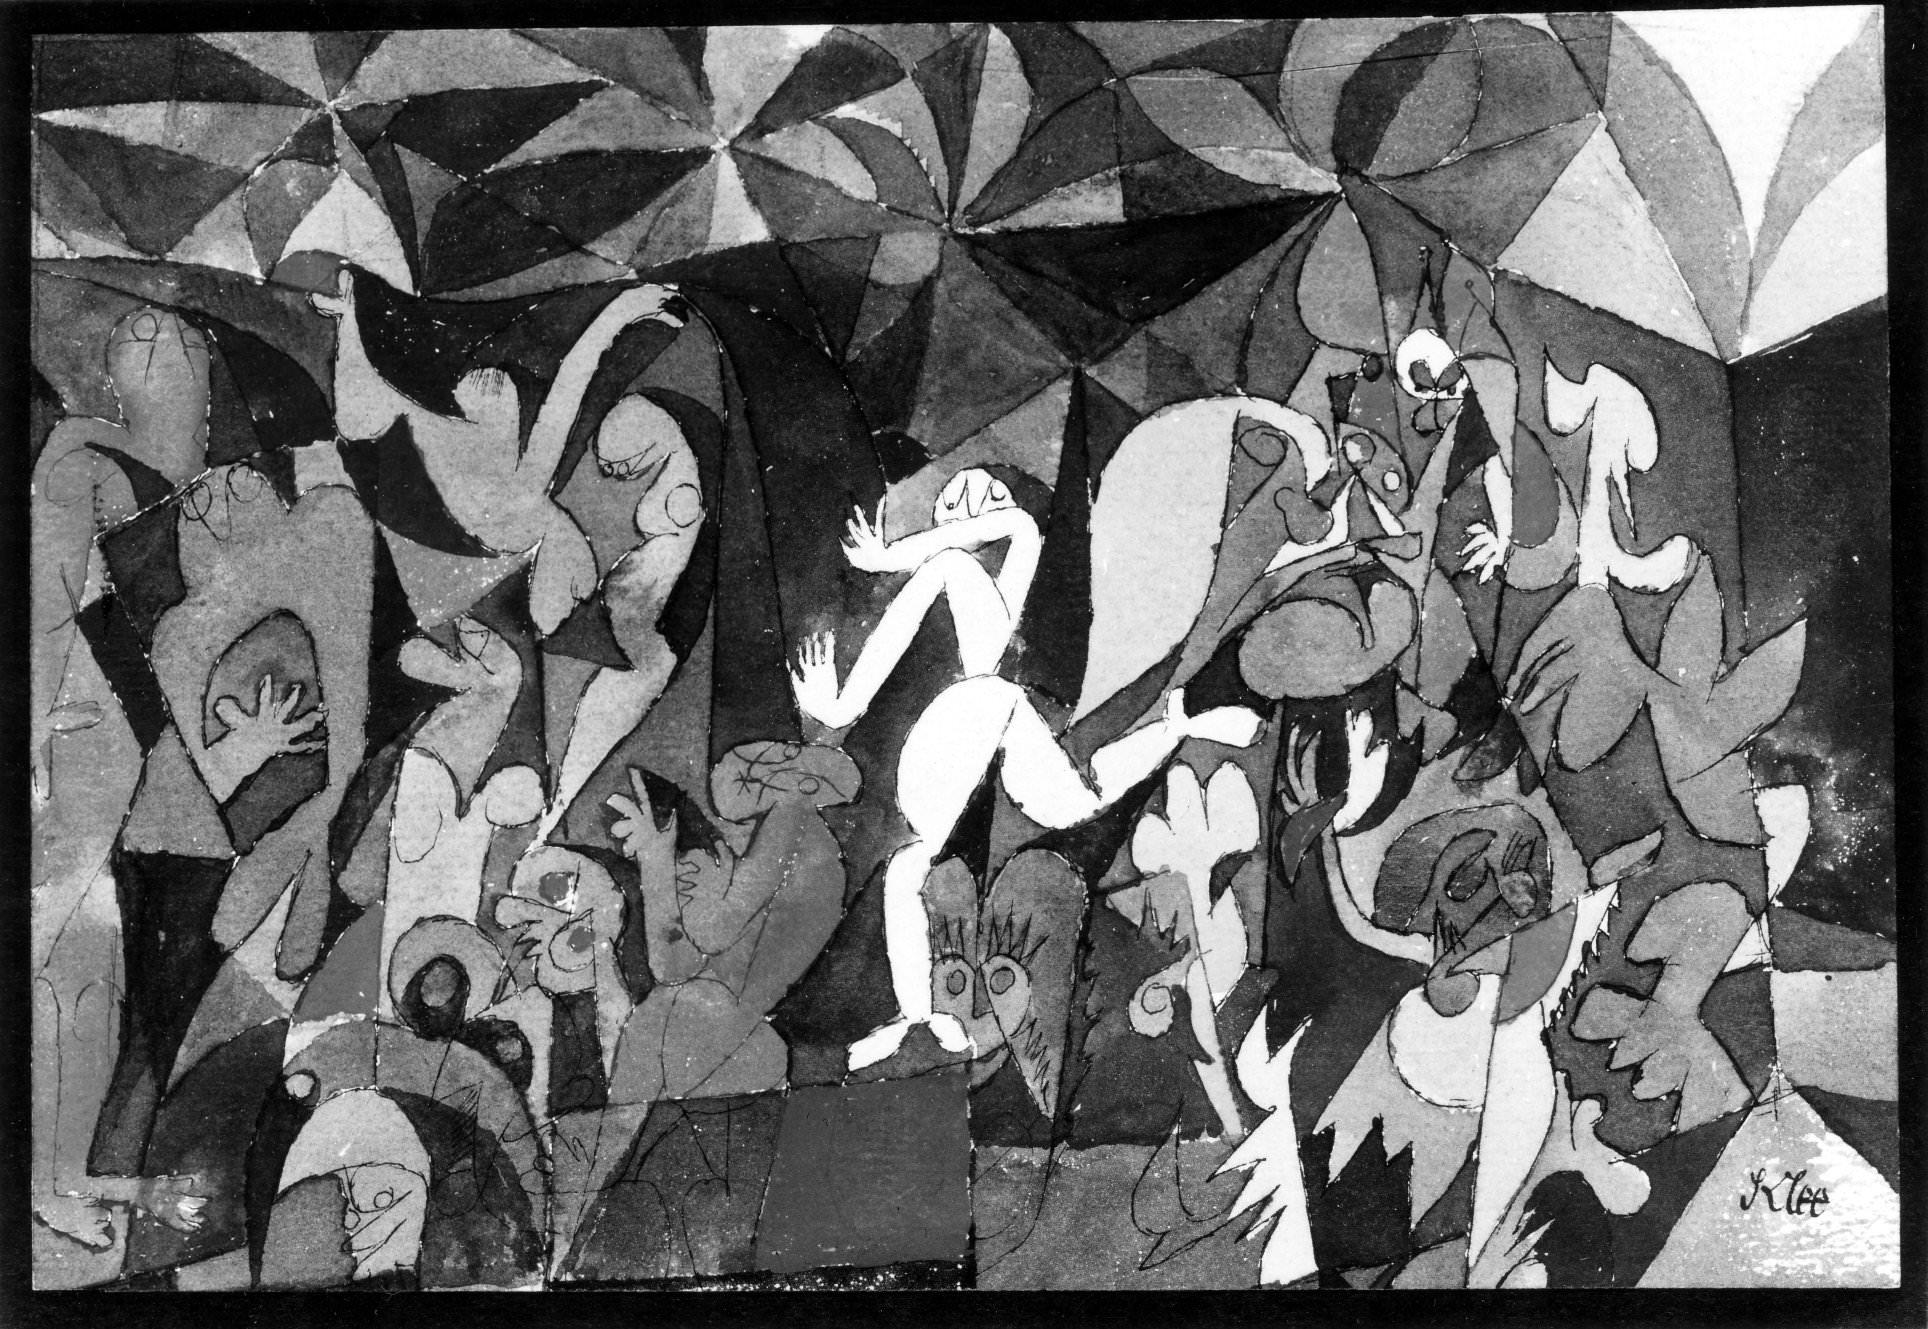 fig. 6 Paul Klee,  bunte Menschen  [Colourful People], 1914, 52, Aquarell auf Papier, 13.8 x 20.4 cm, Location unknown, Photo by Adolf Studly (?), ©Zentrum Paul Klee, Bern, Bildarchiv